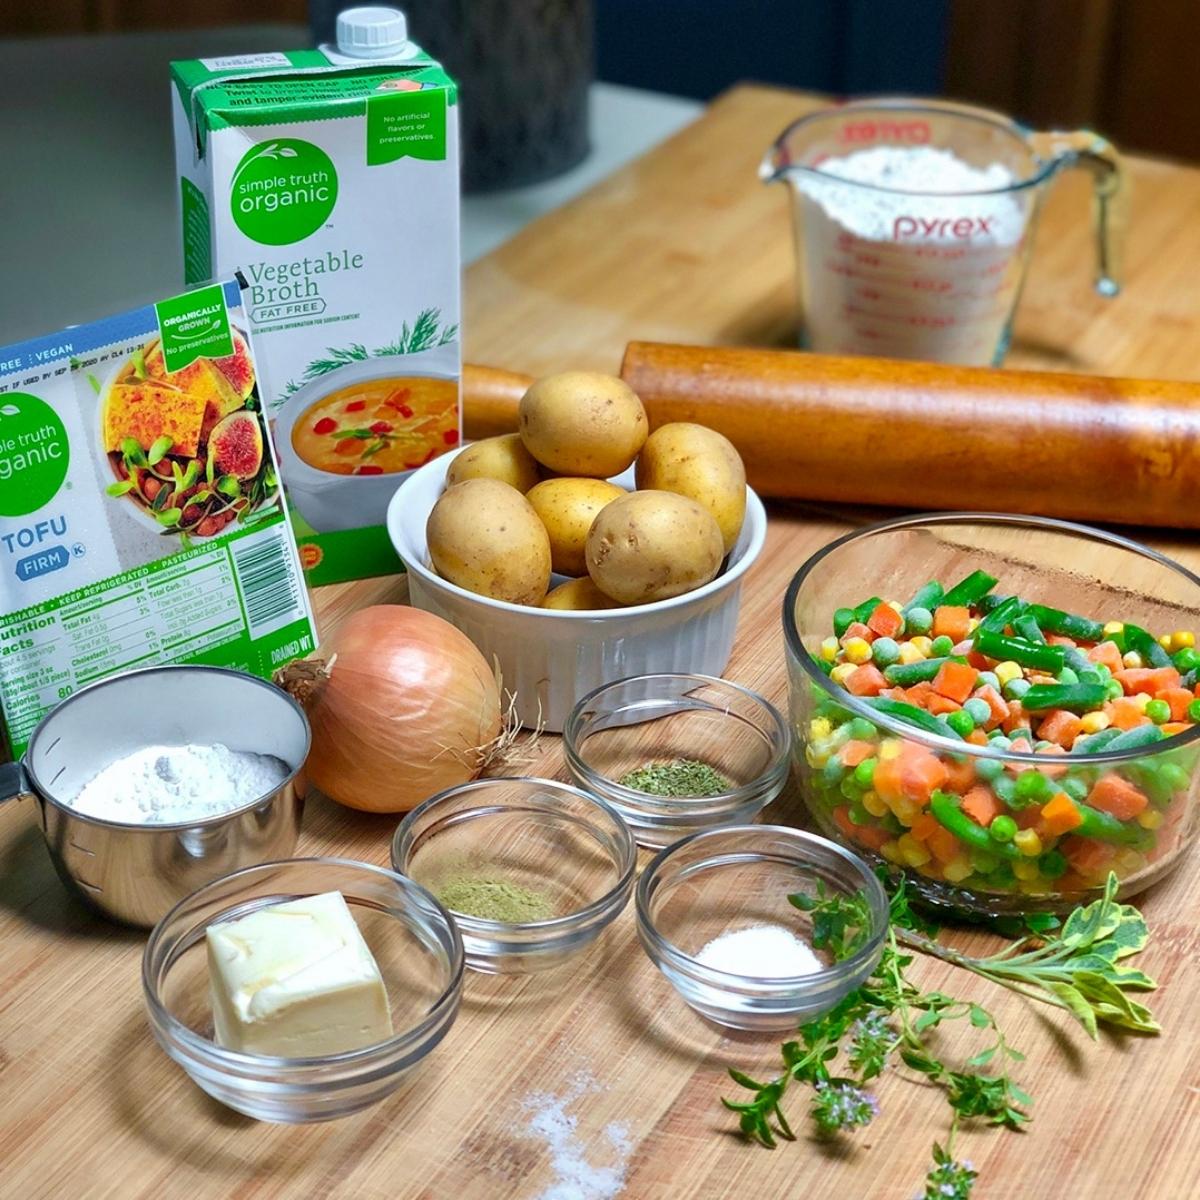 Ingredients for preparing homemade vegan pot pie with tofu, including tofu, vegetable broth, potatoes, onion, mixed veggies, butter, flour and seasonings.